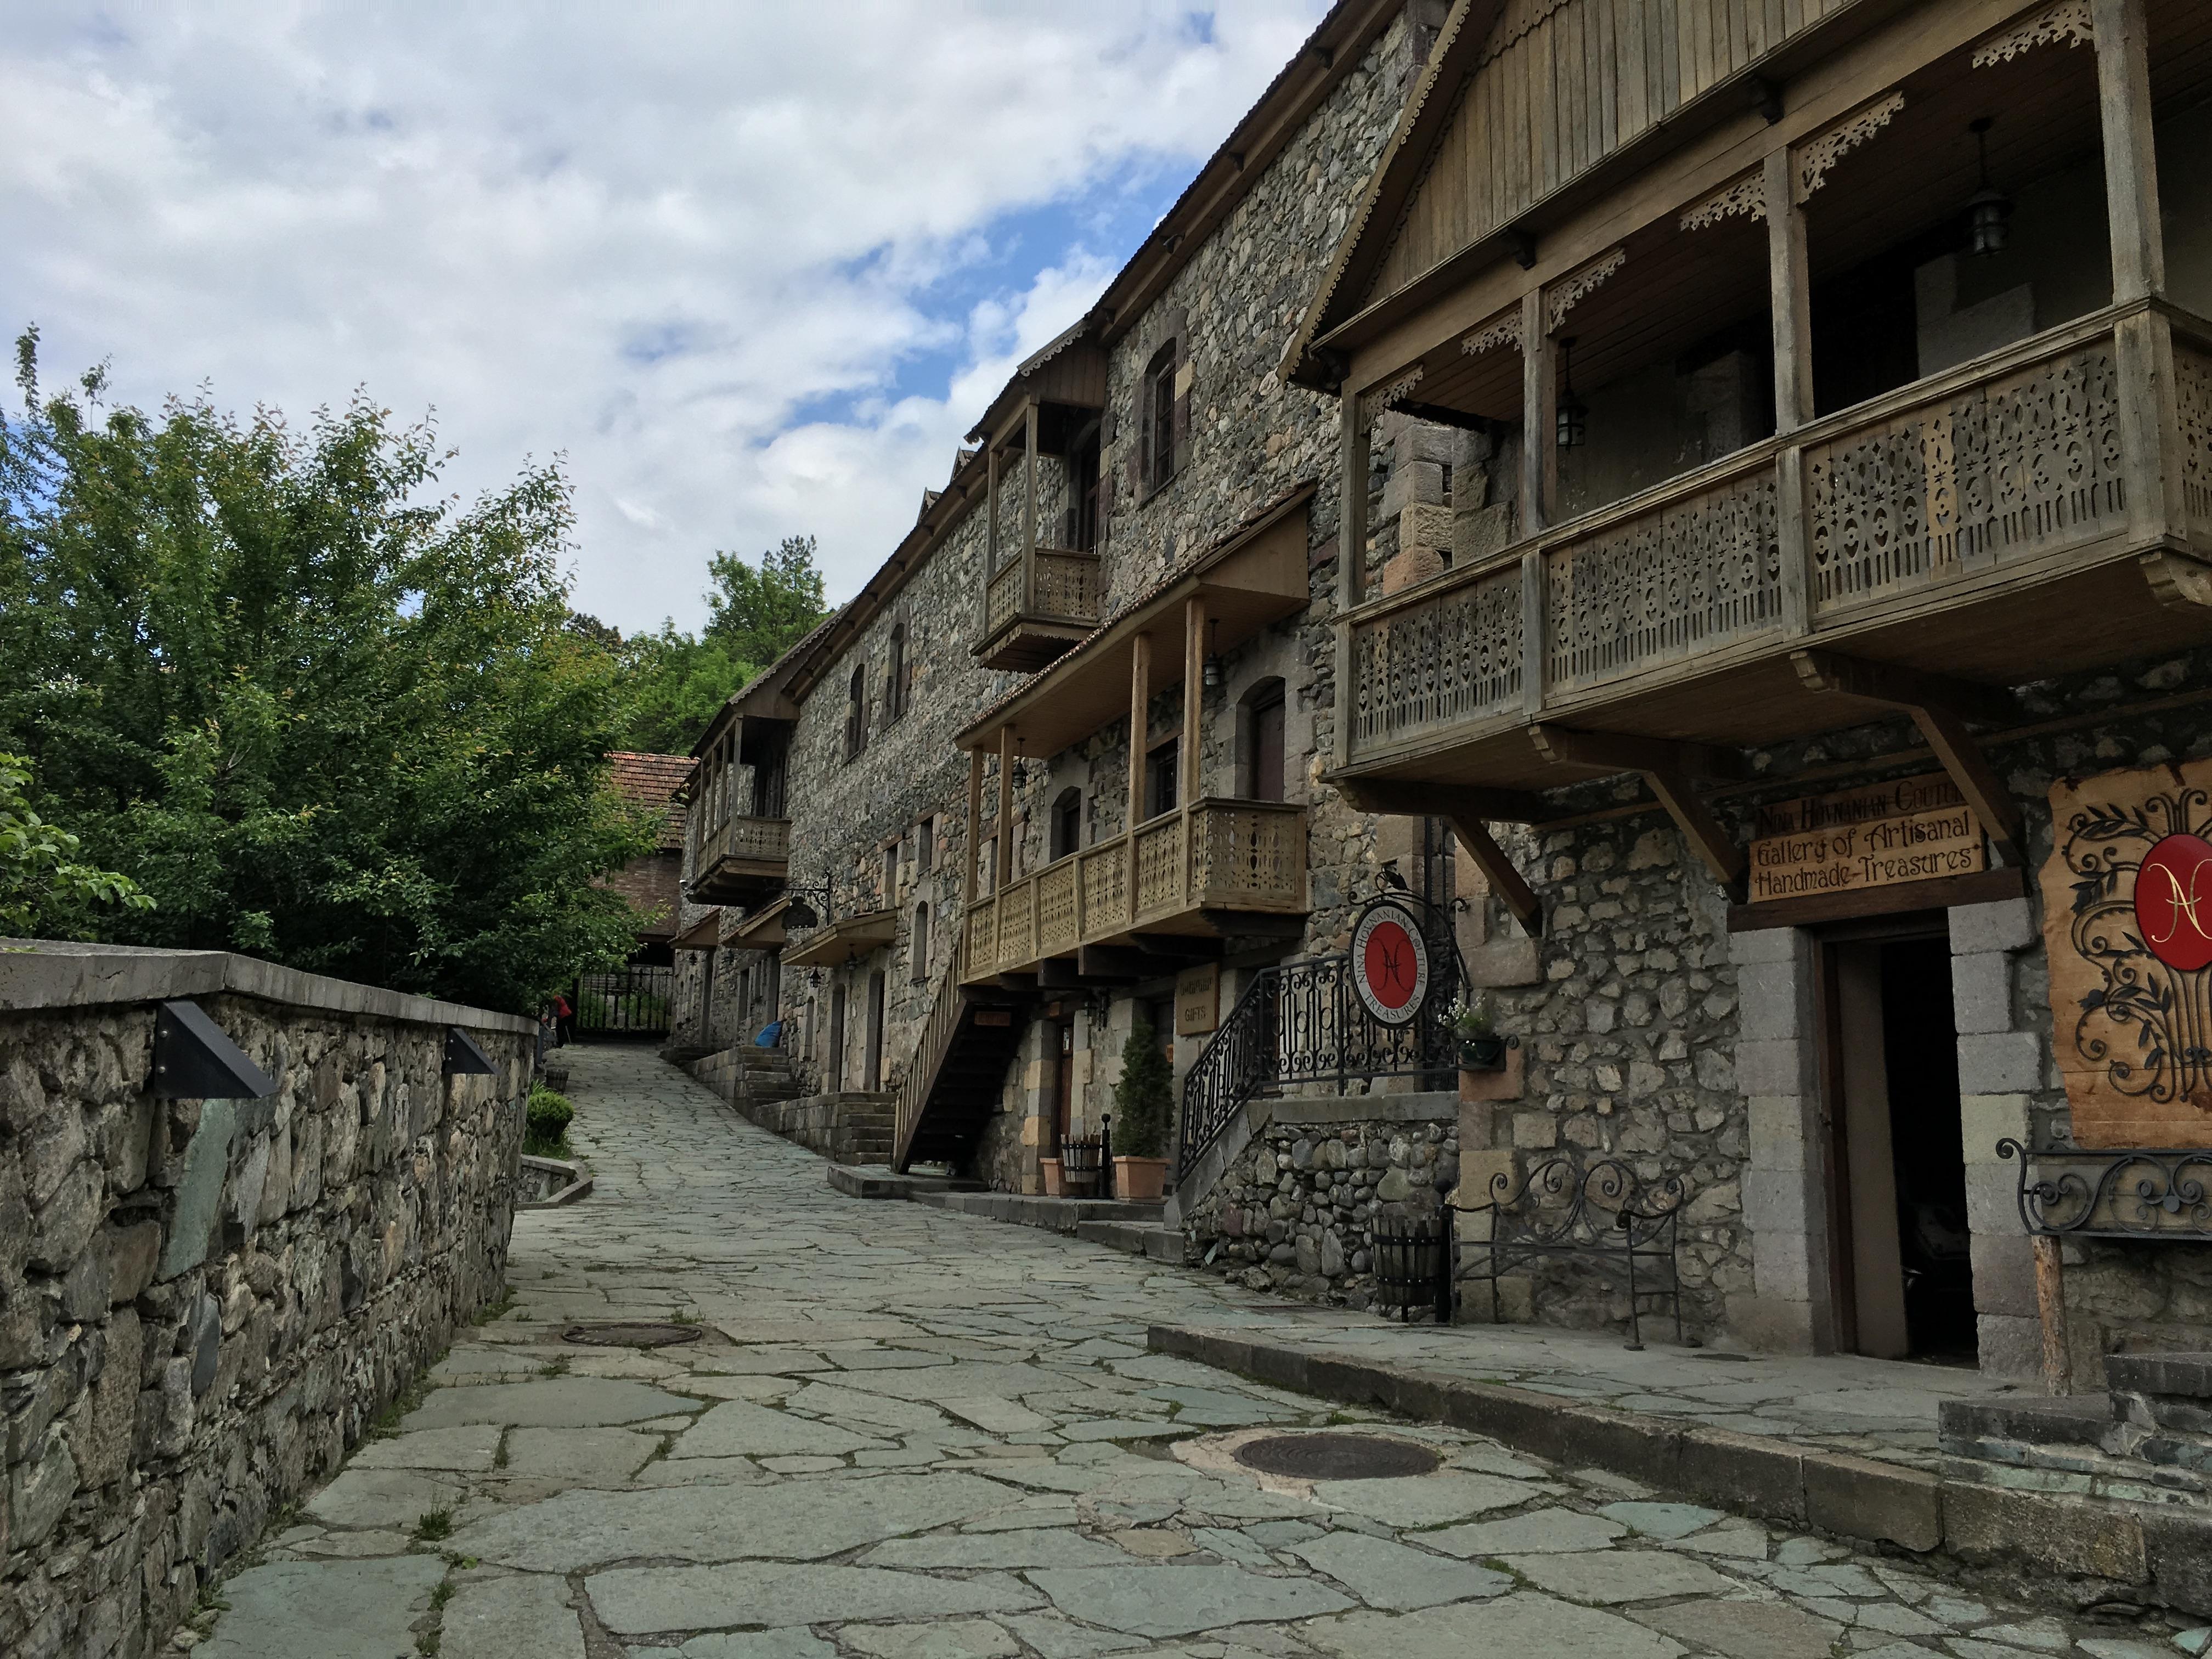 Sharambeyan straat - Dilidzjan